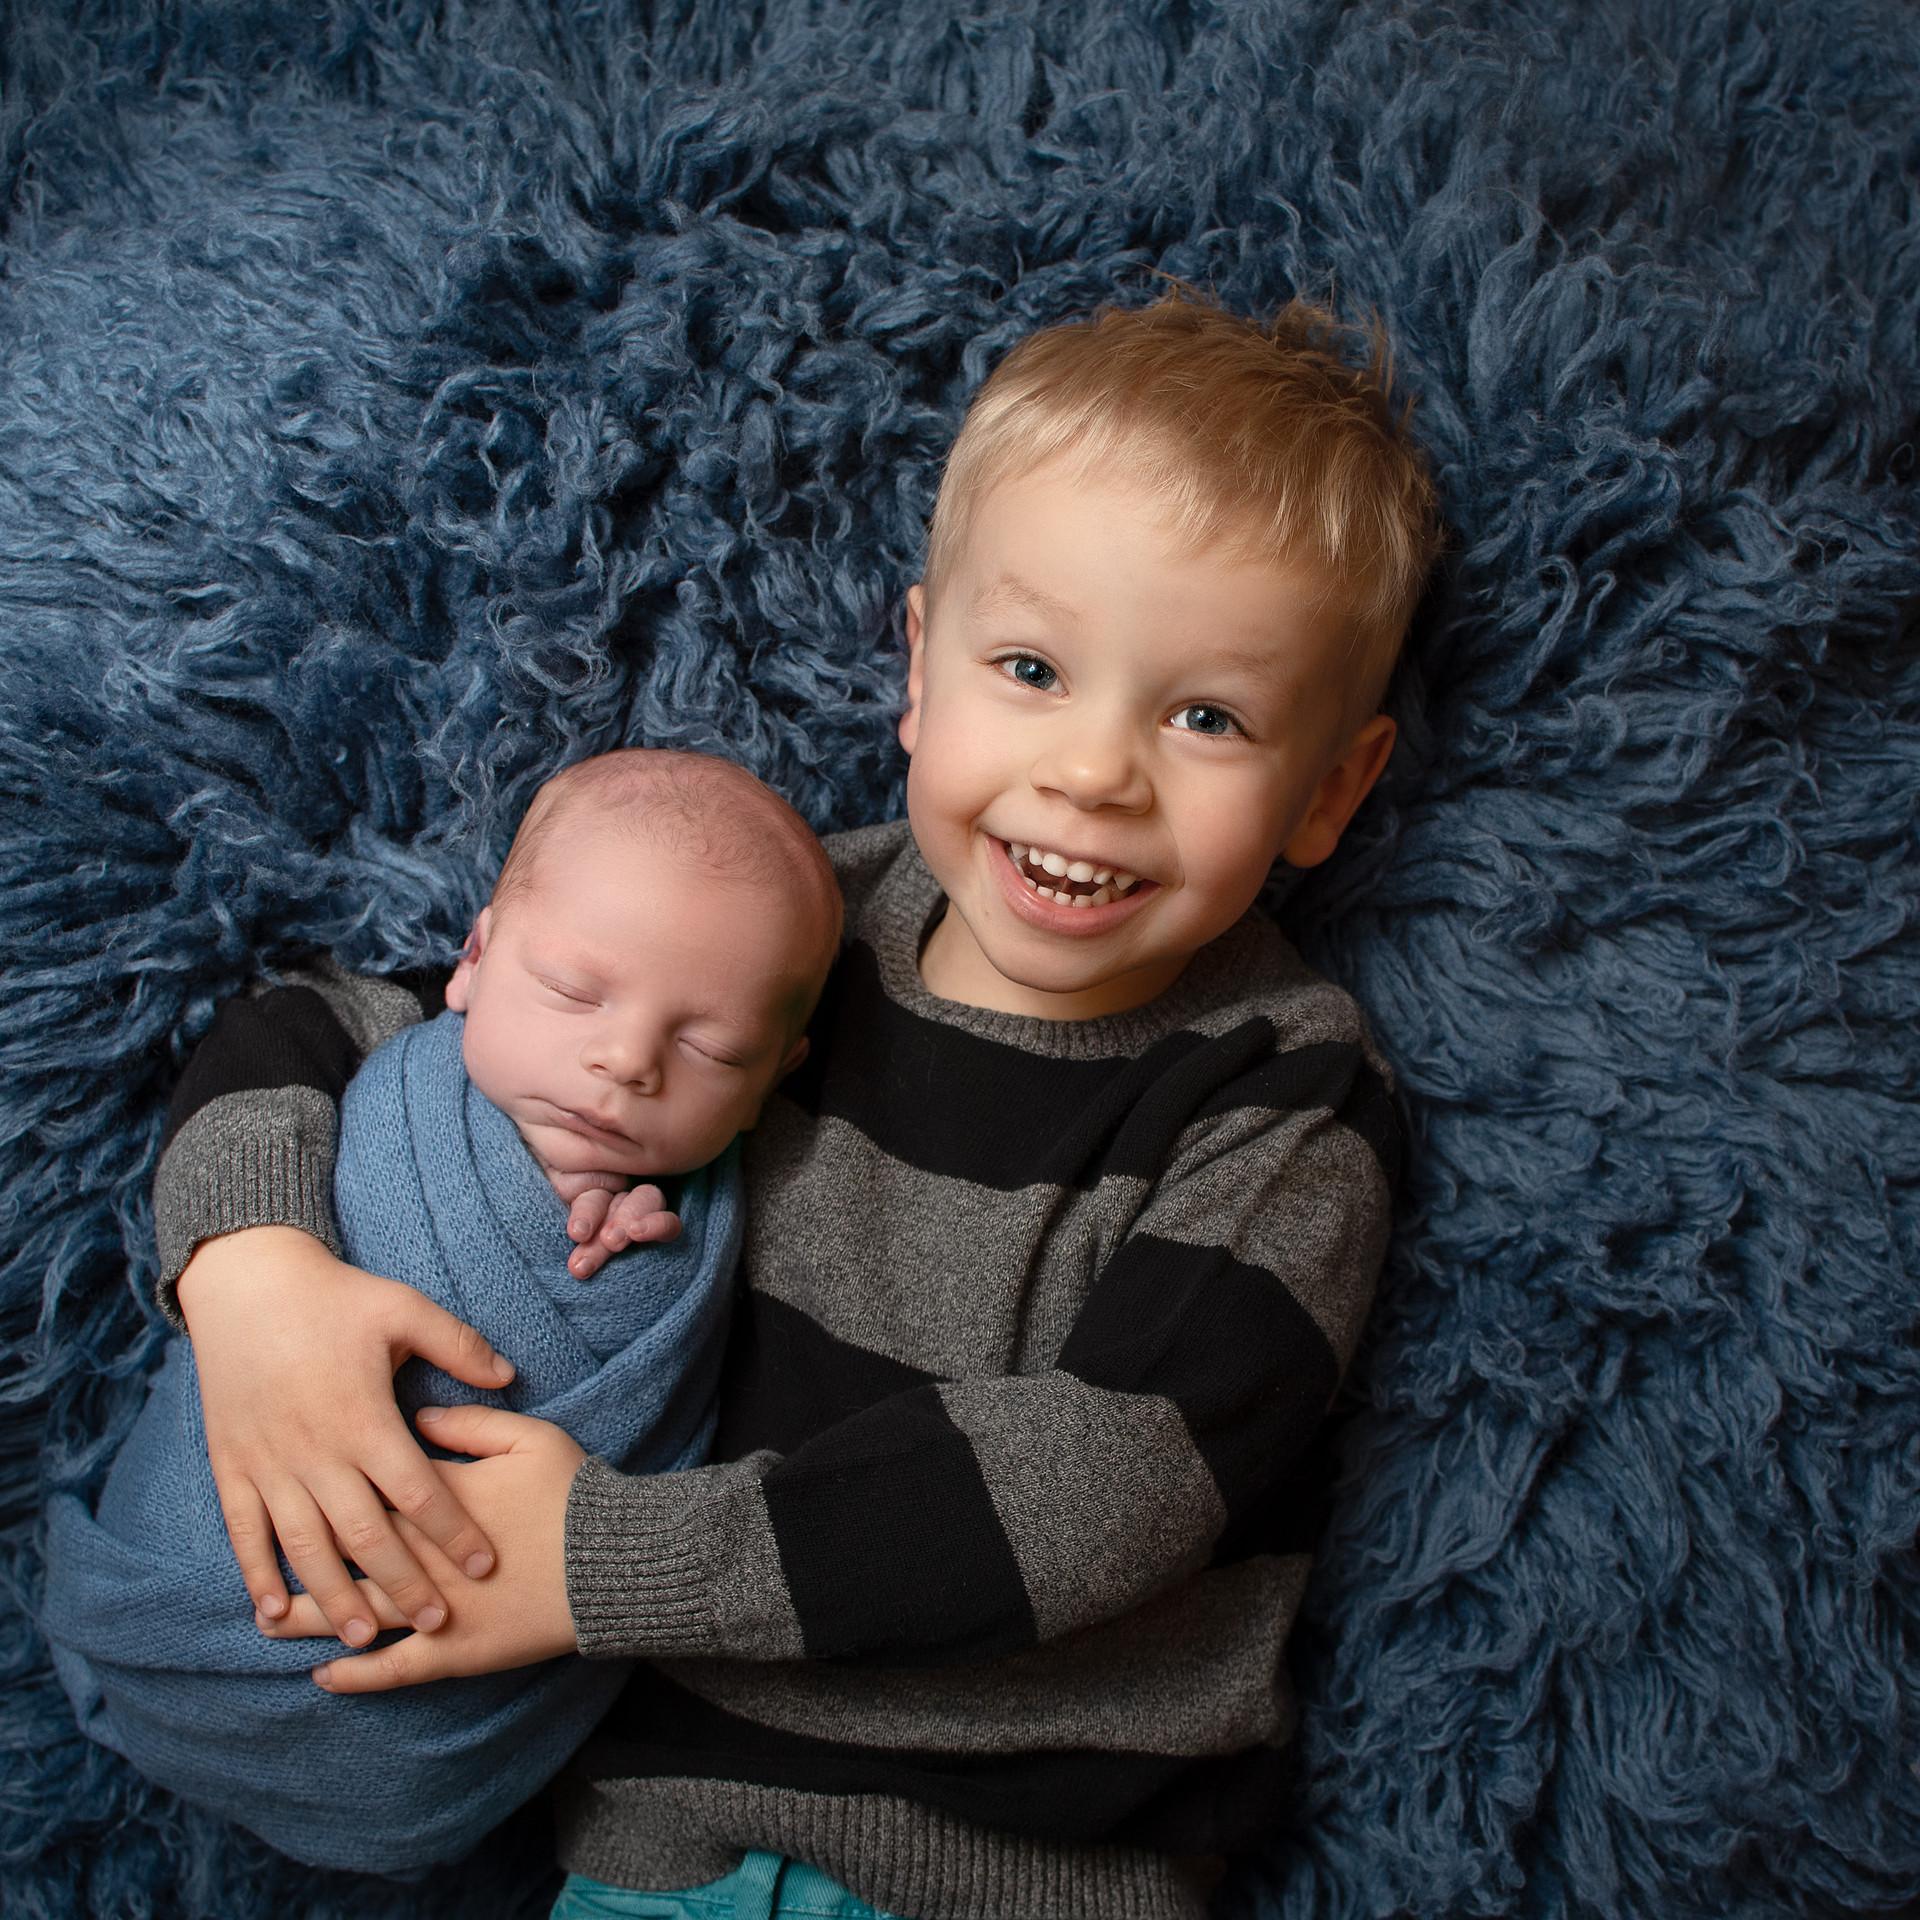 newborn and toddler